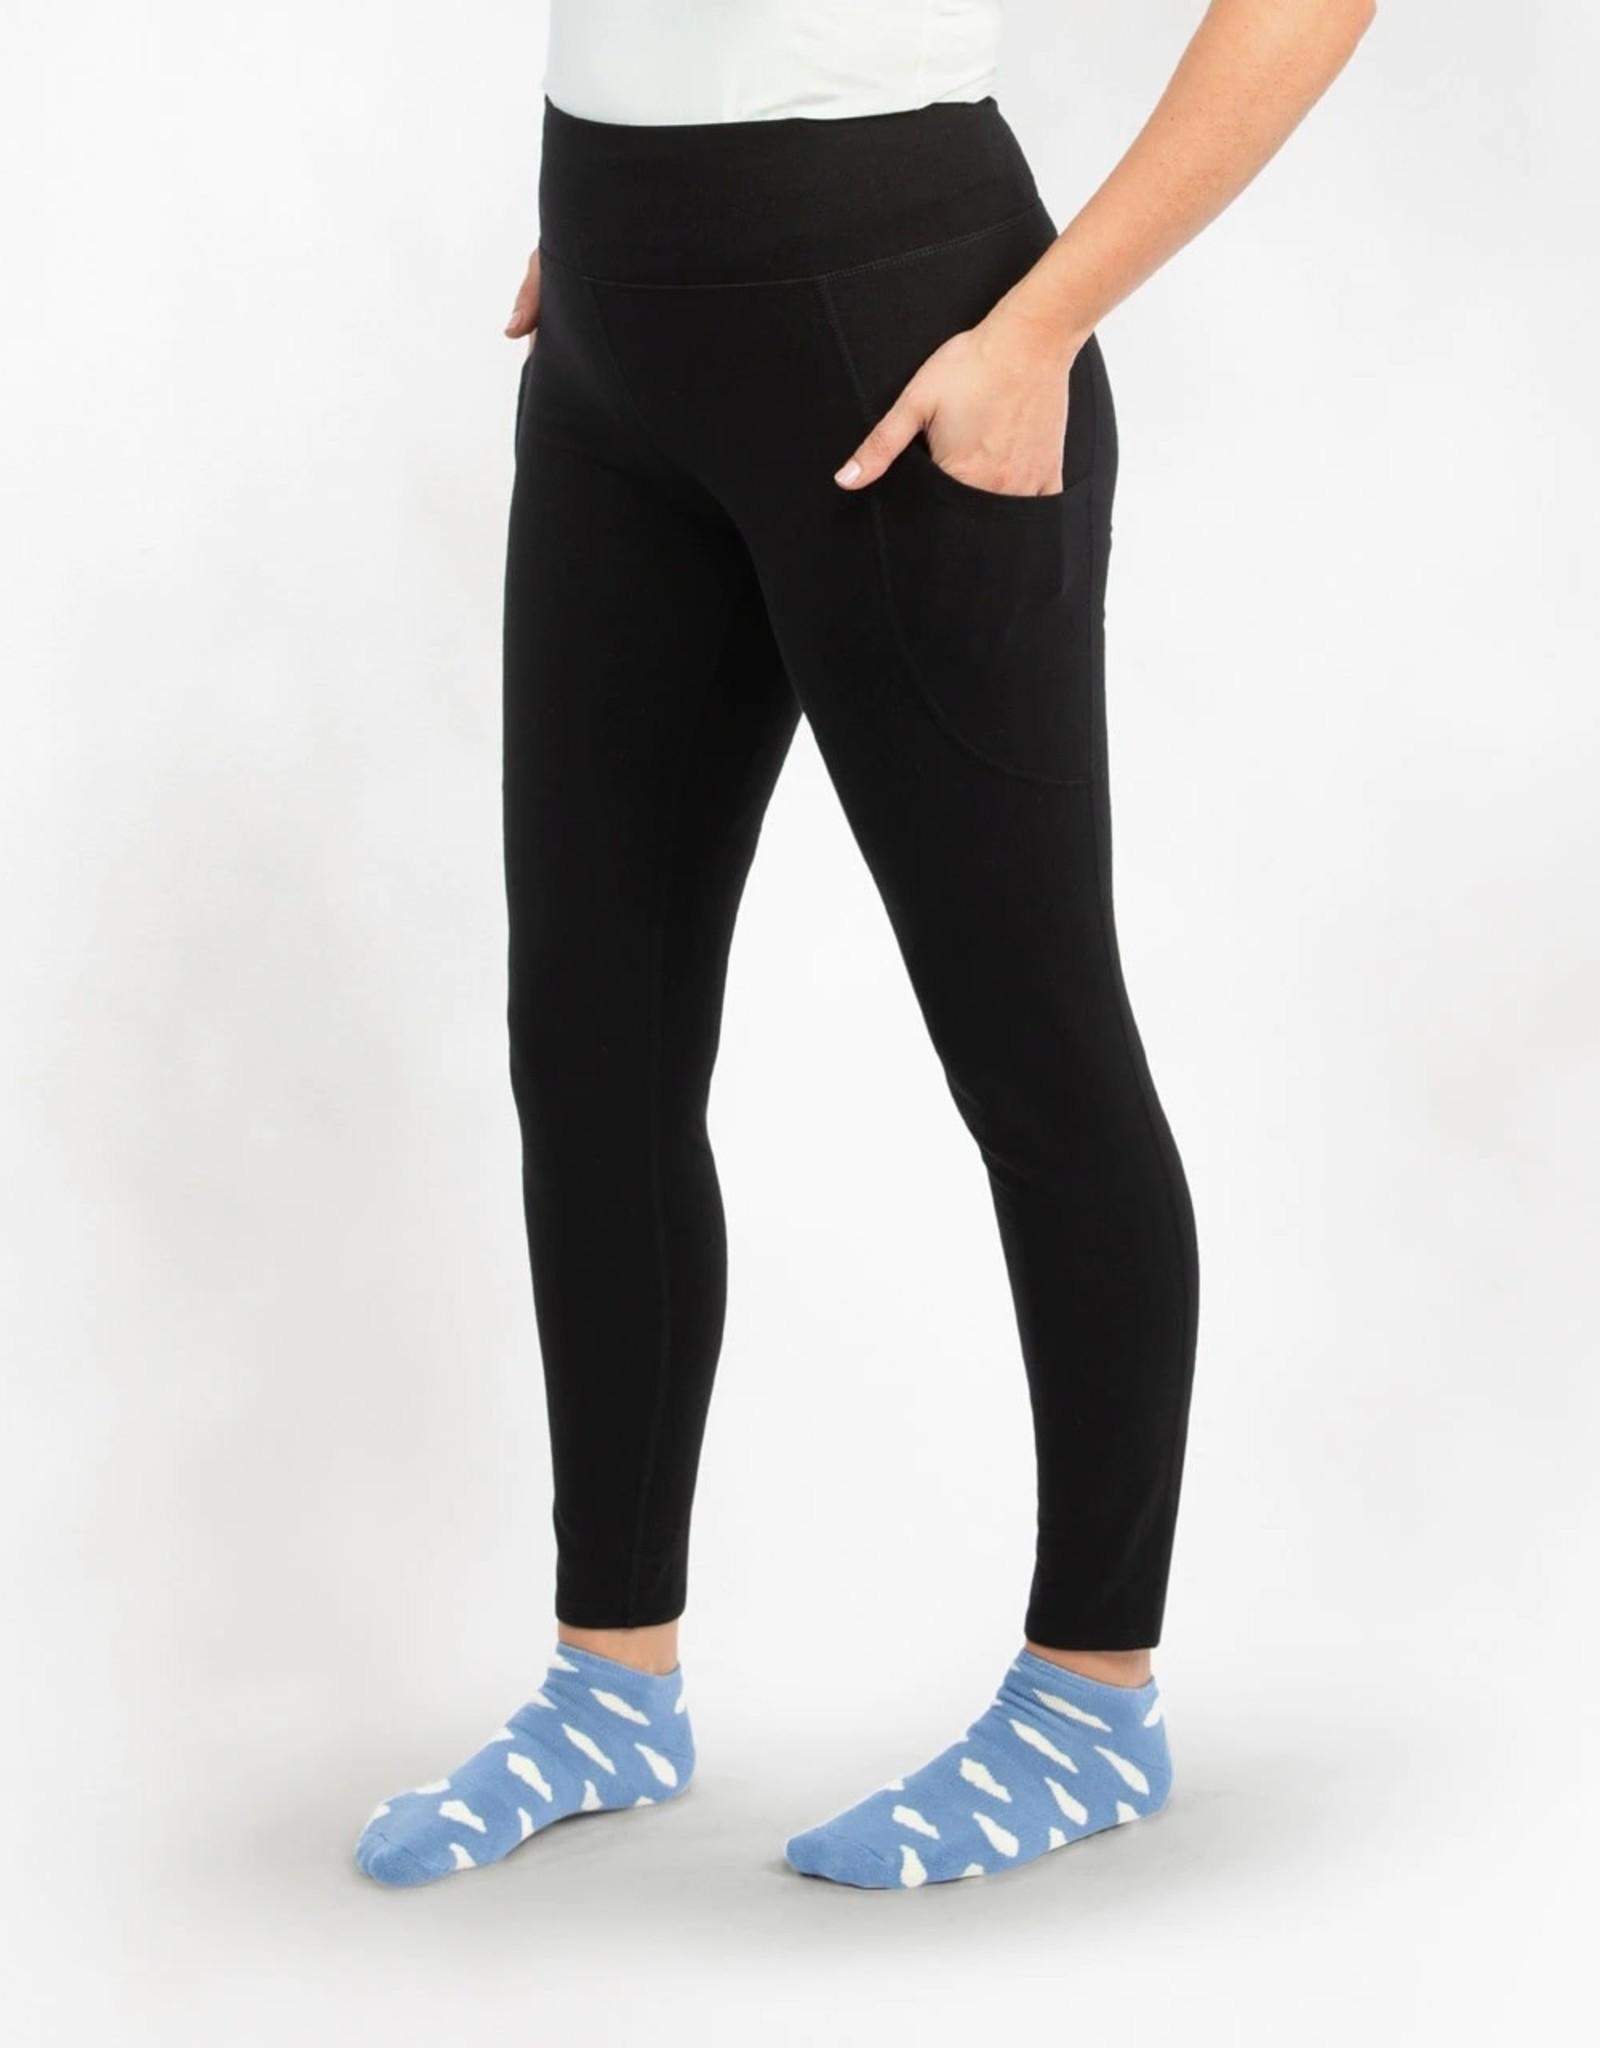 Maggie's Organics Blackout Leggings - Ankle Length